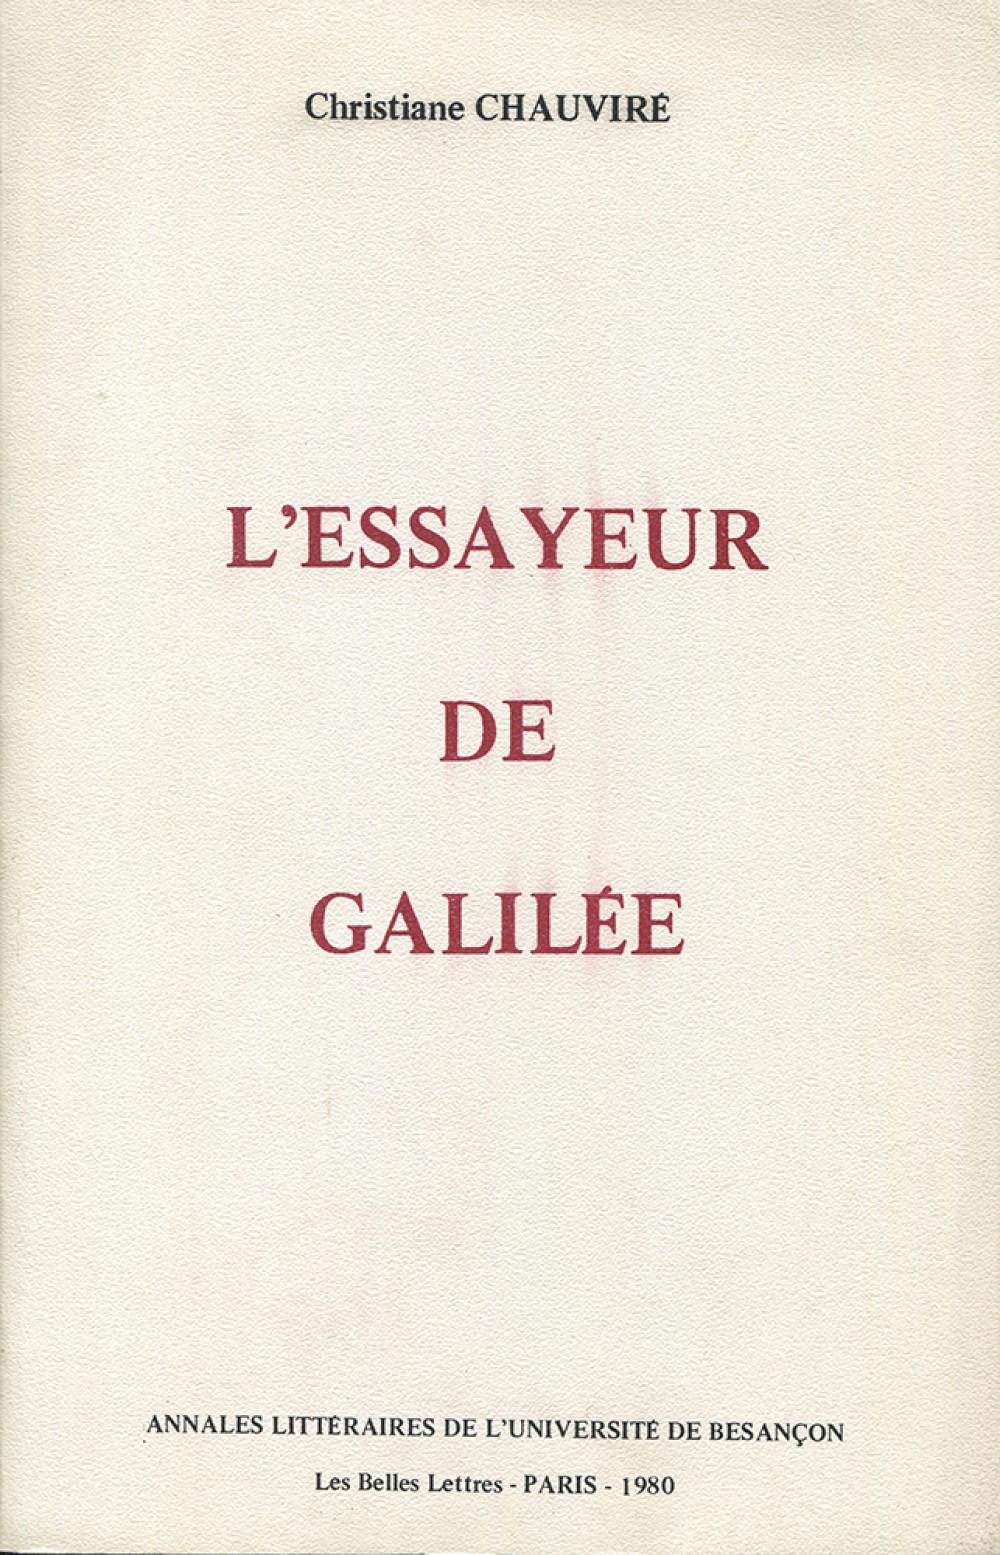 L'essayeur de Galilée